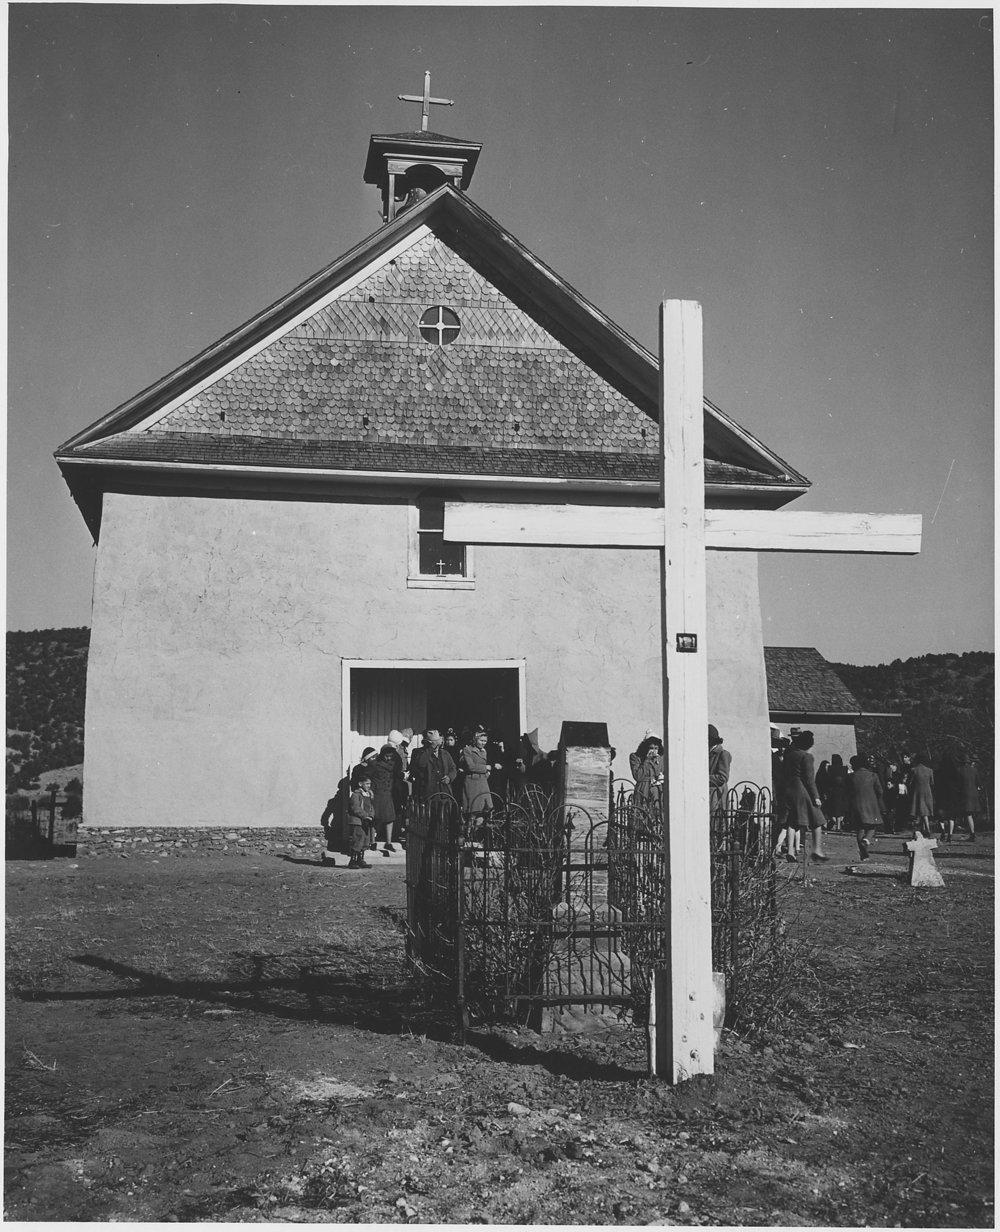 Arroyo_seco_church.jpg